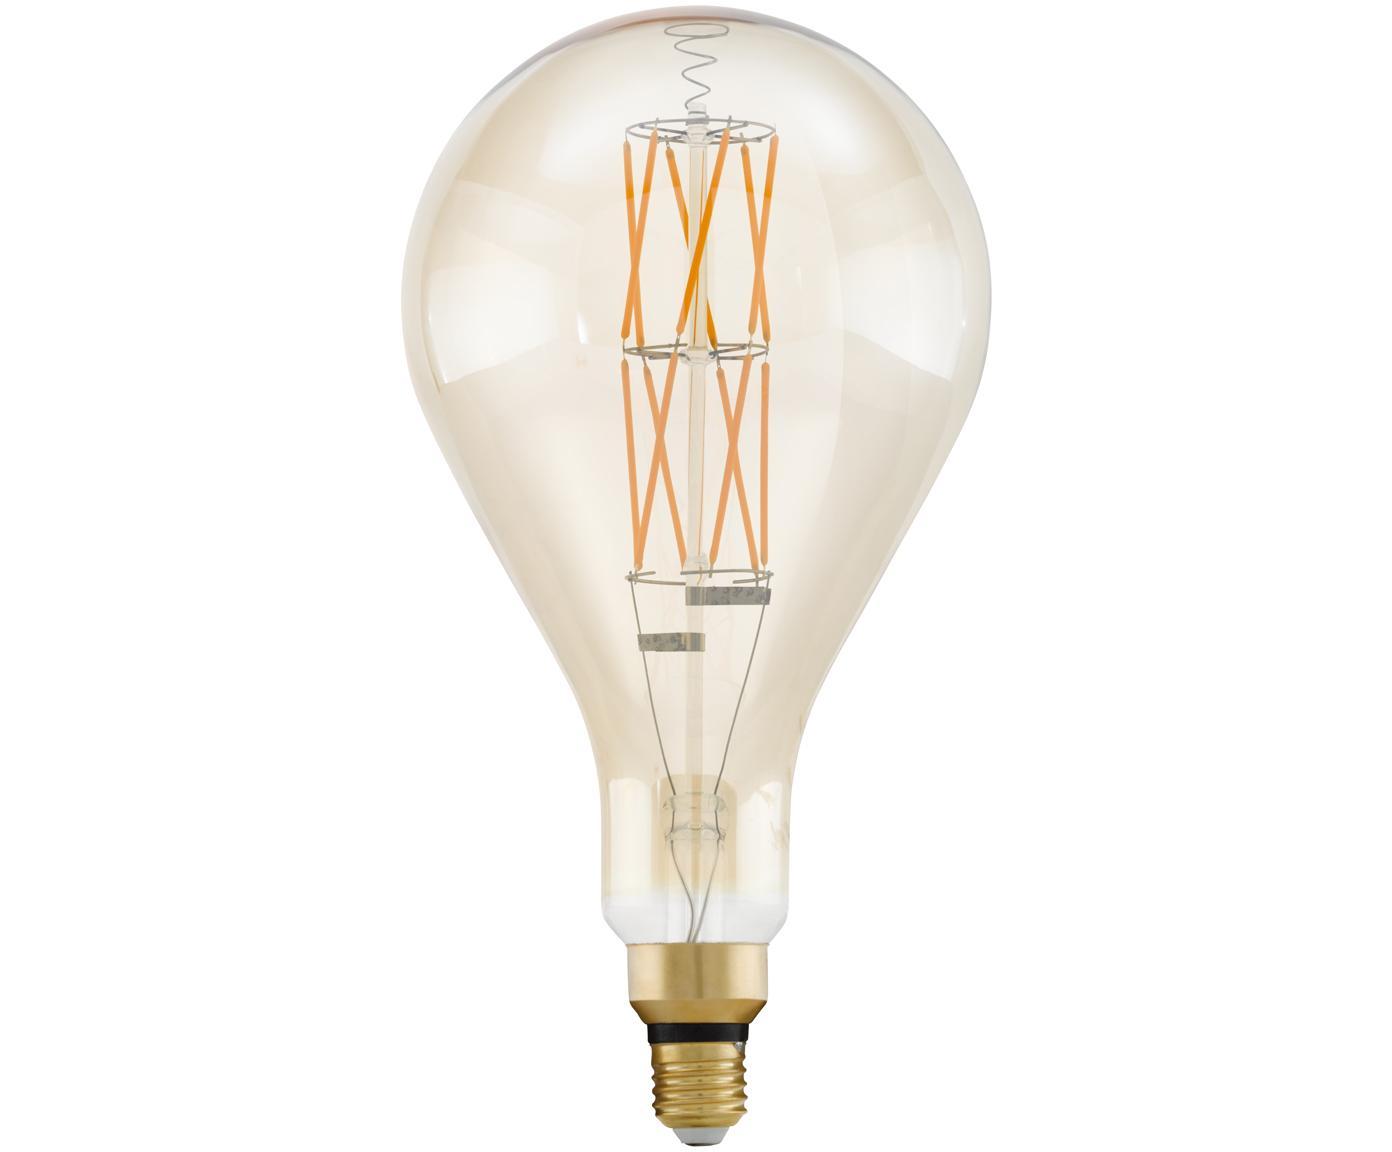 Lampadina a LED XL Crisscross (E27 / 8Watt), Lampadina: vetro, Trasparente ambra, Ø 16 x Alt. 30 cm